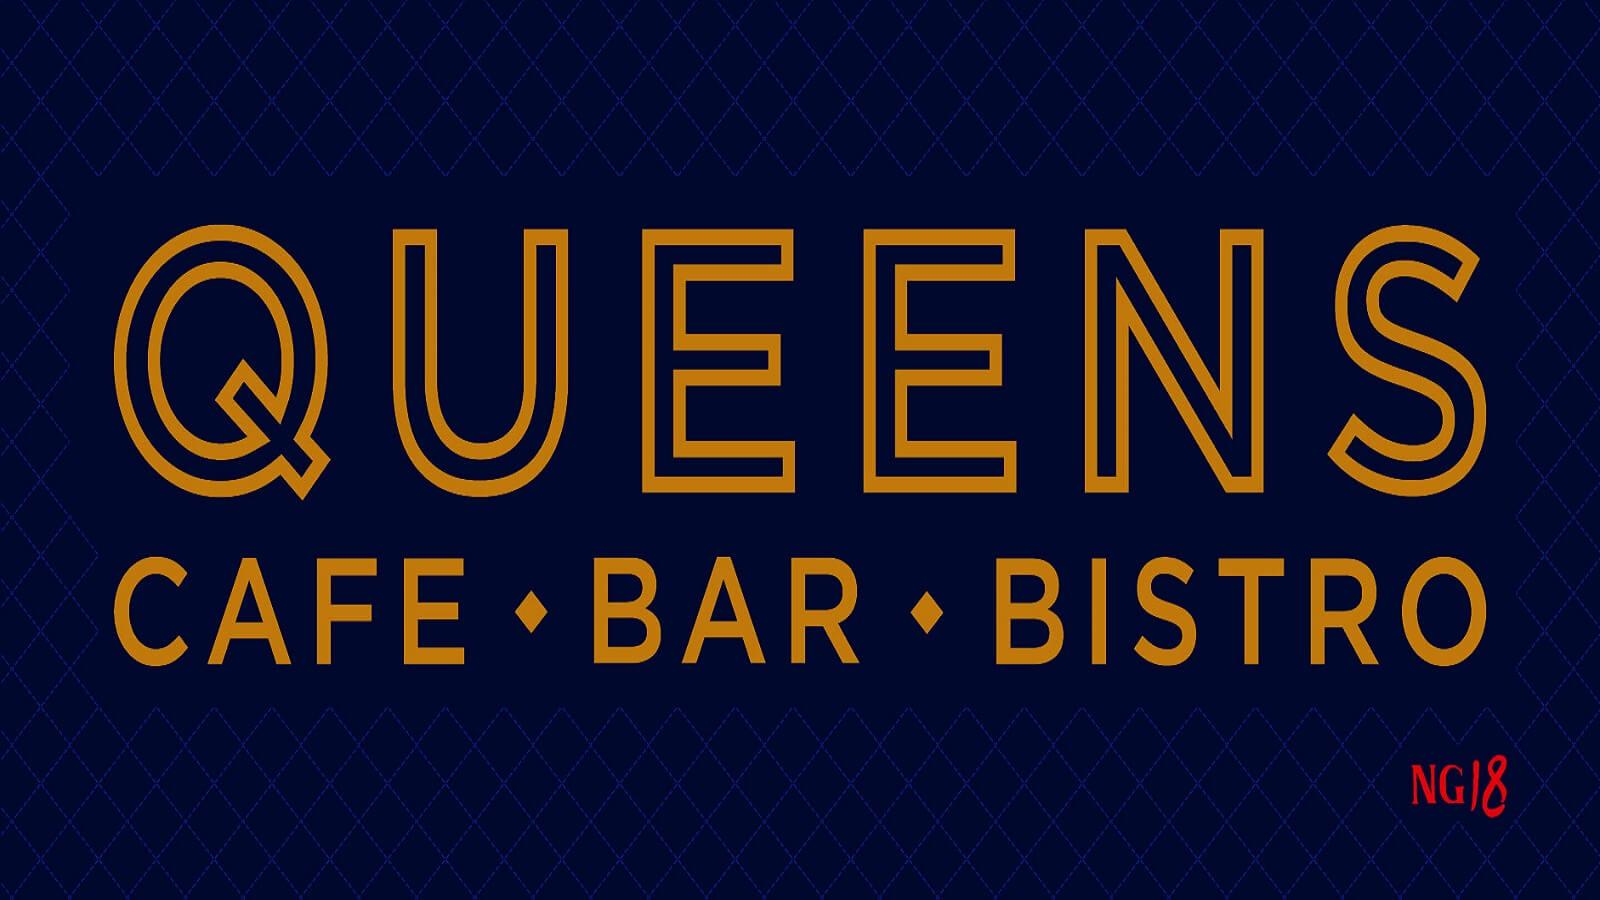 Queens Cafe Bar Bistro